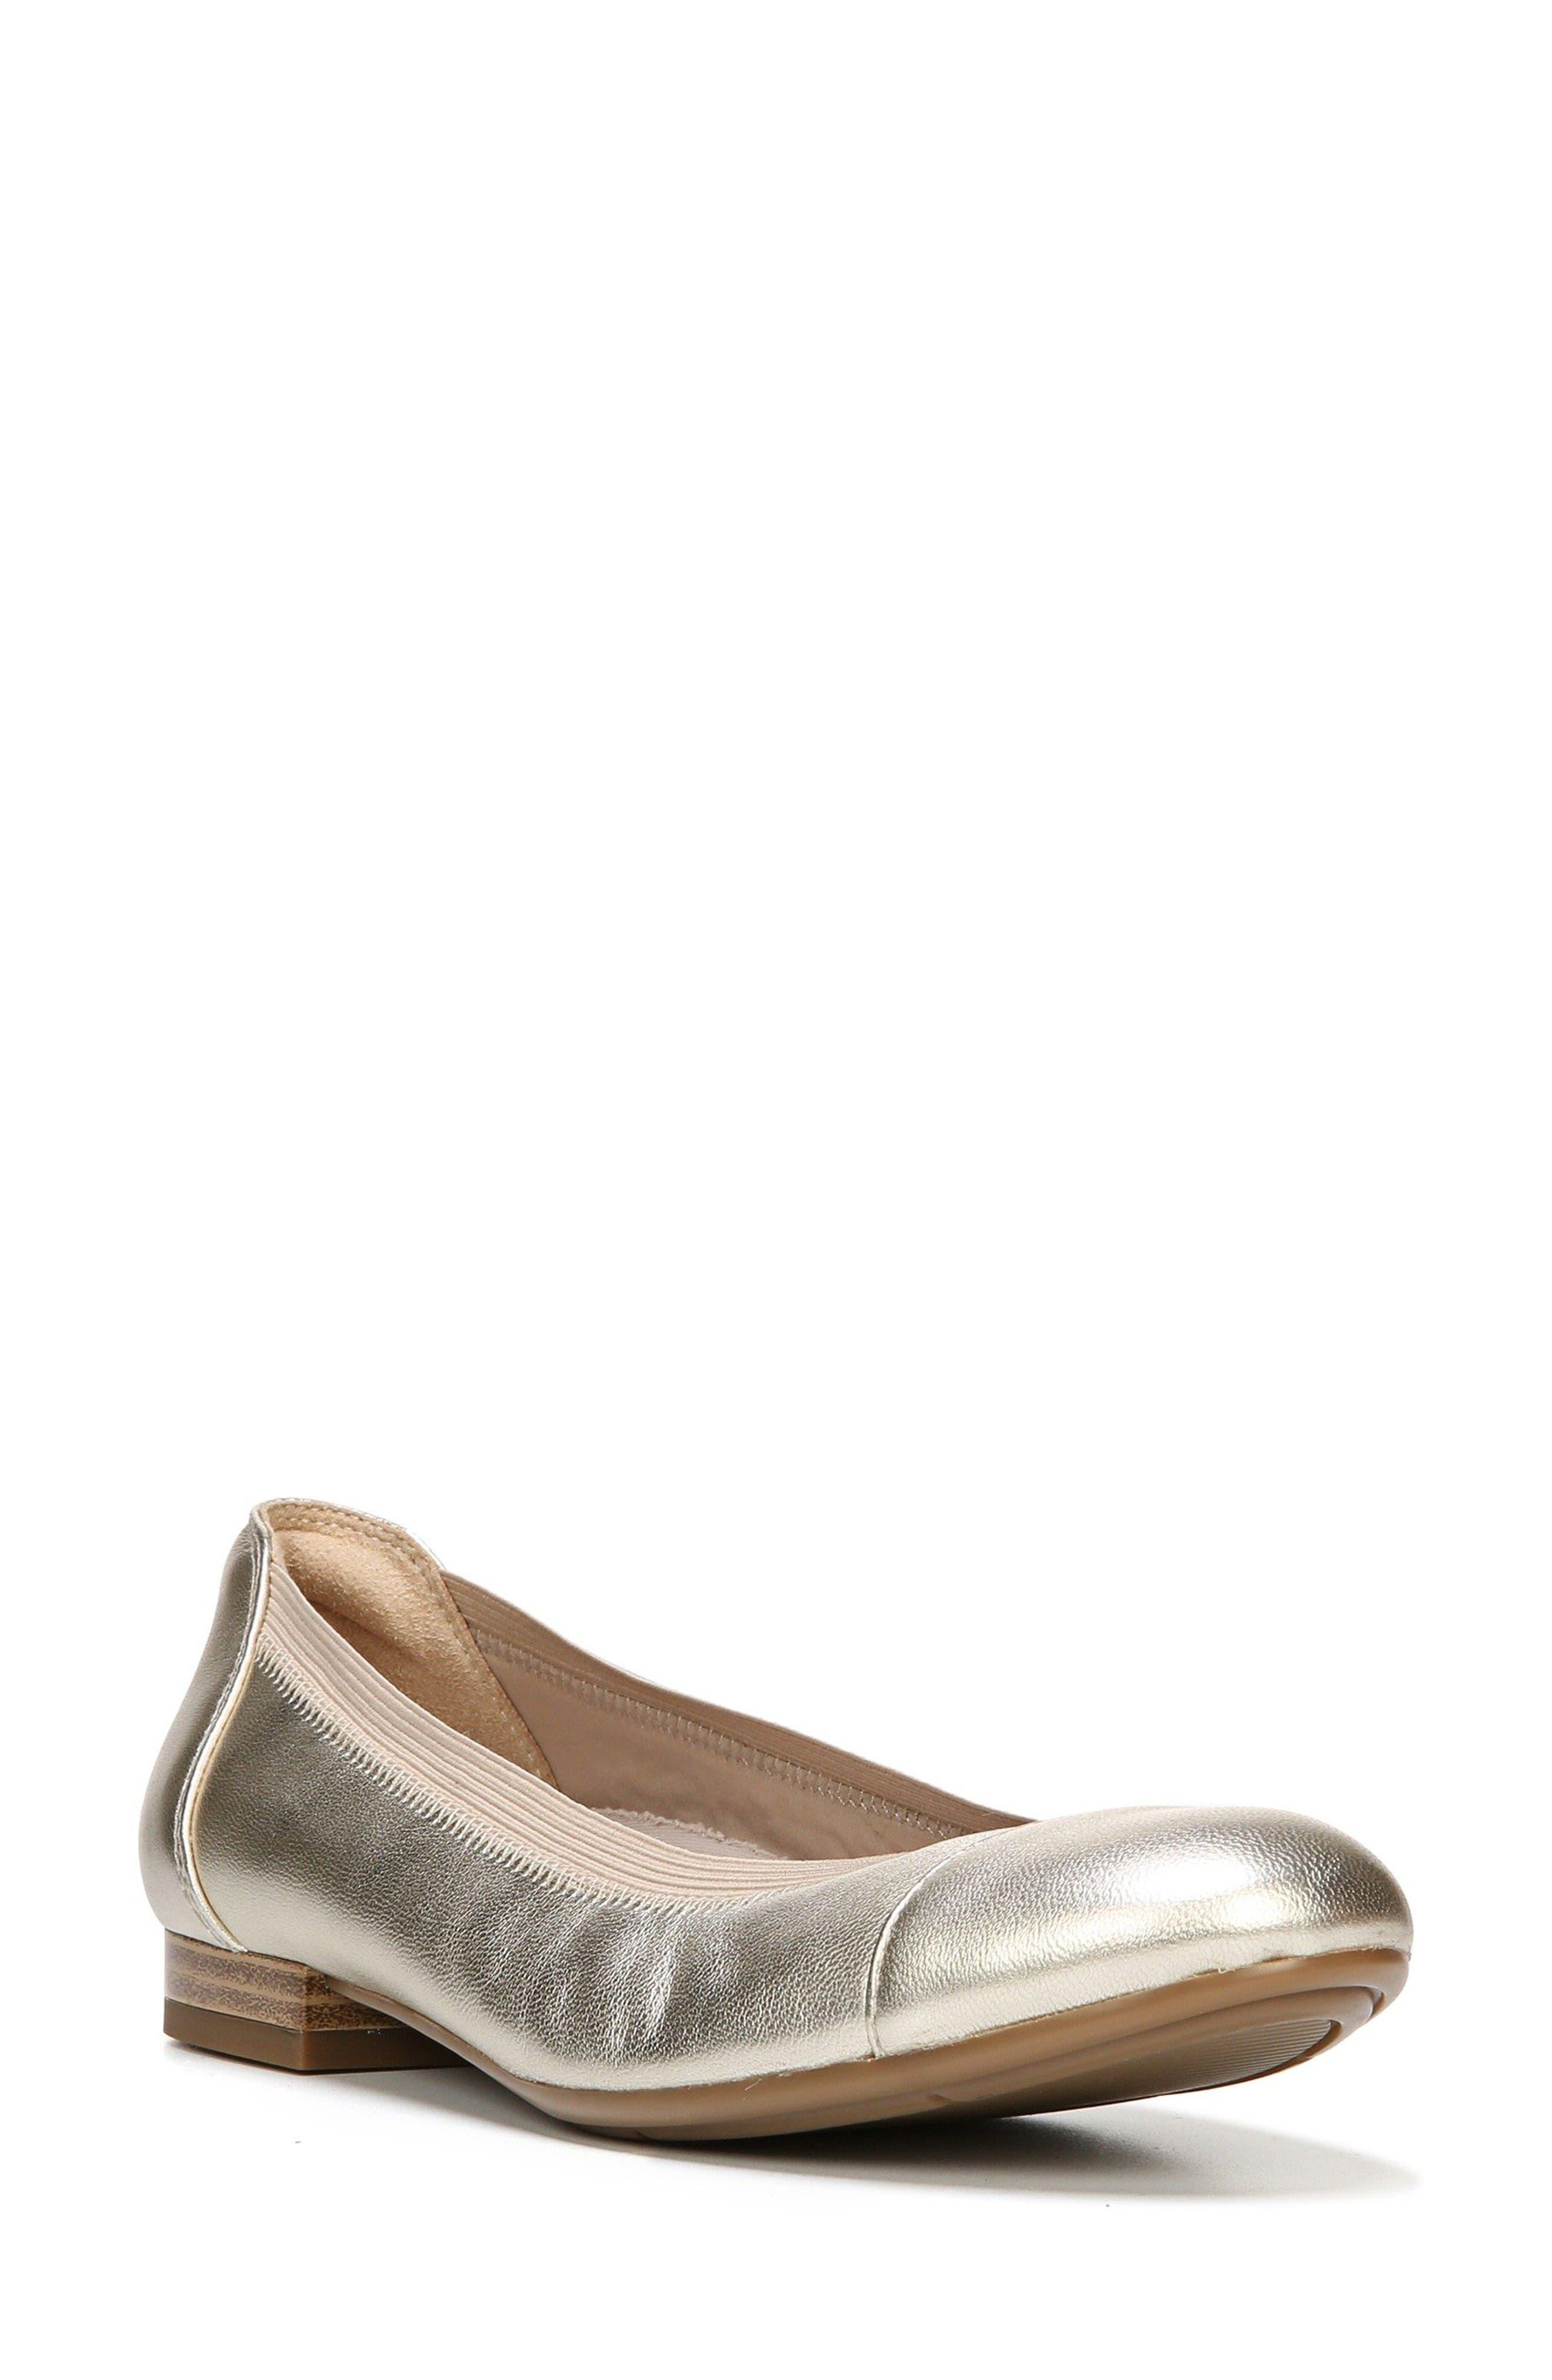 Naturalizer Therese Cap Toe Flat (Women)